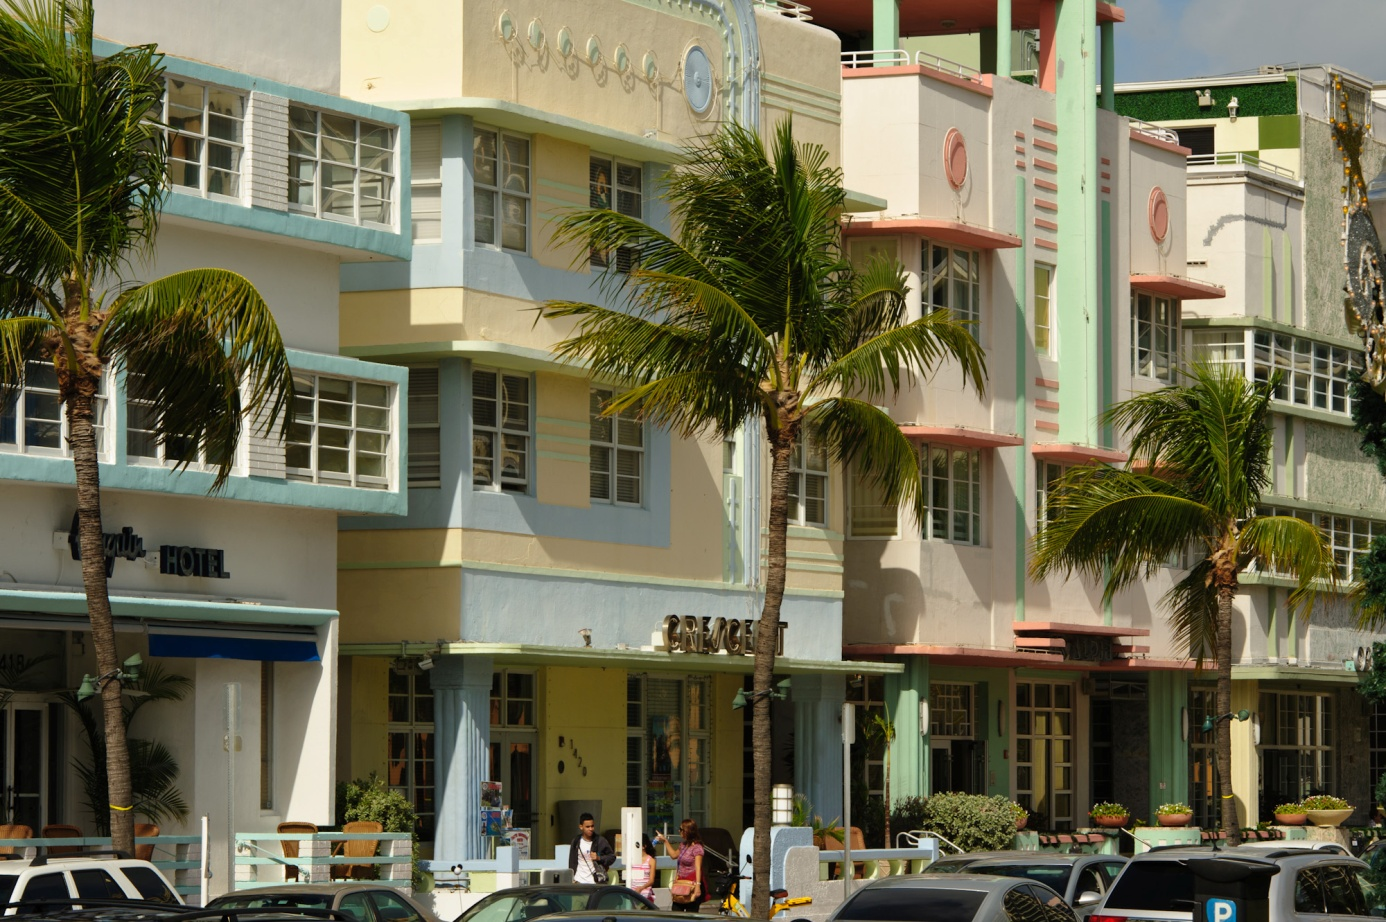 South Beach architecture